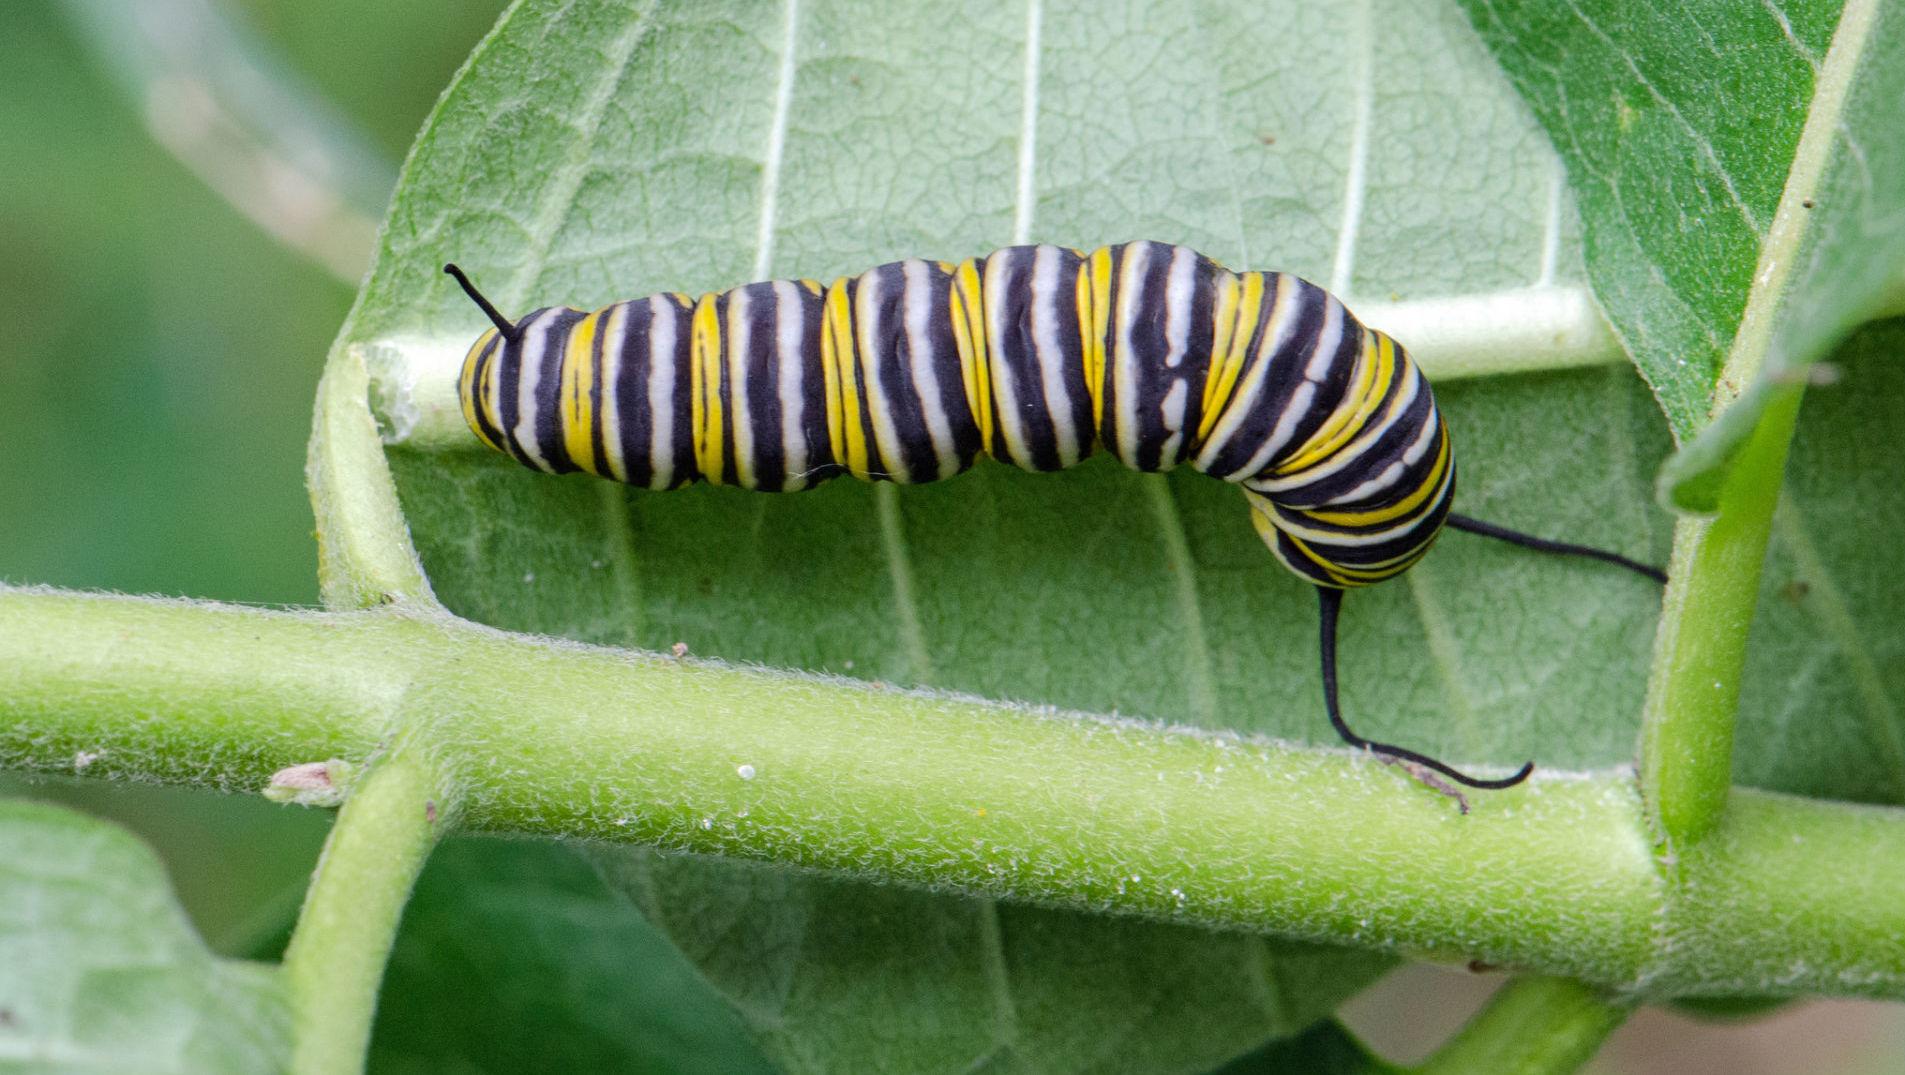 Monarch caterpillar. Photo: Flickr/Christa R.